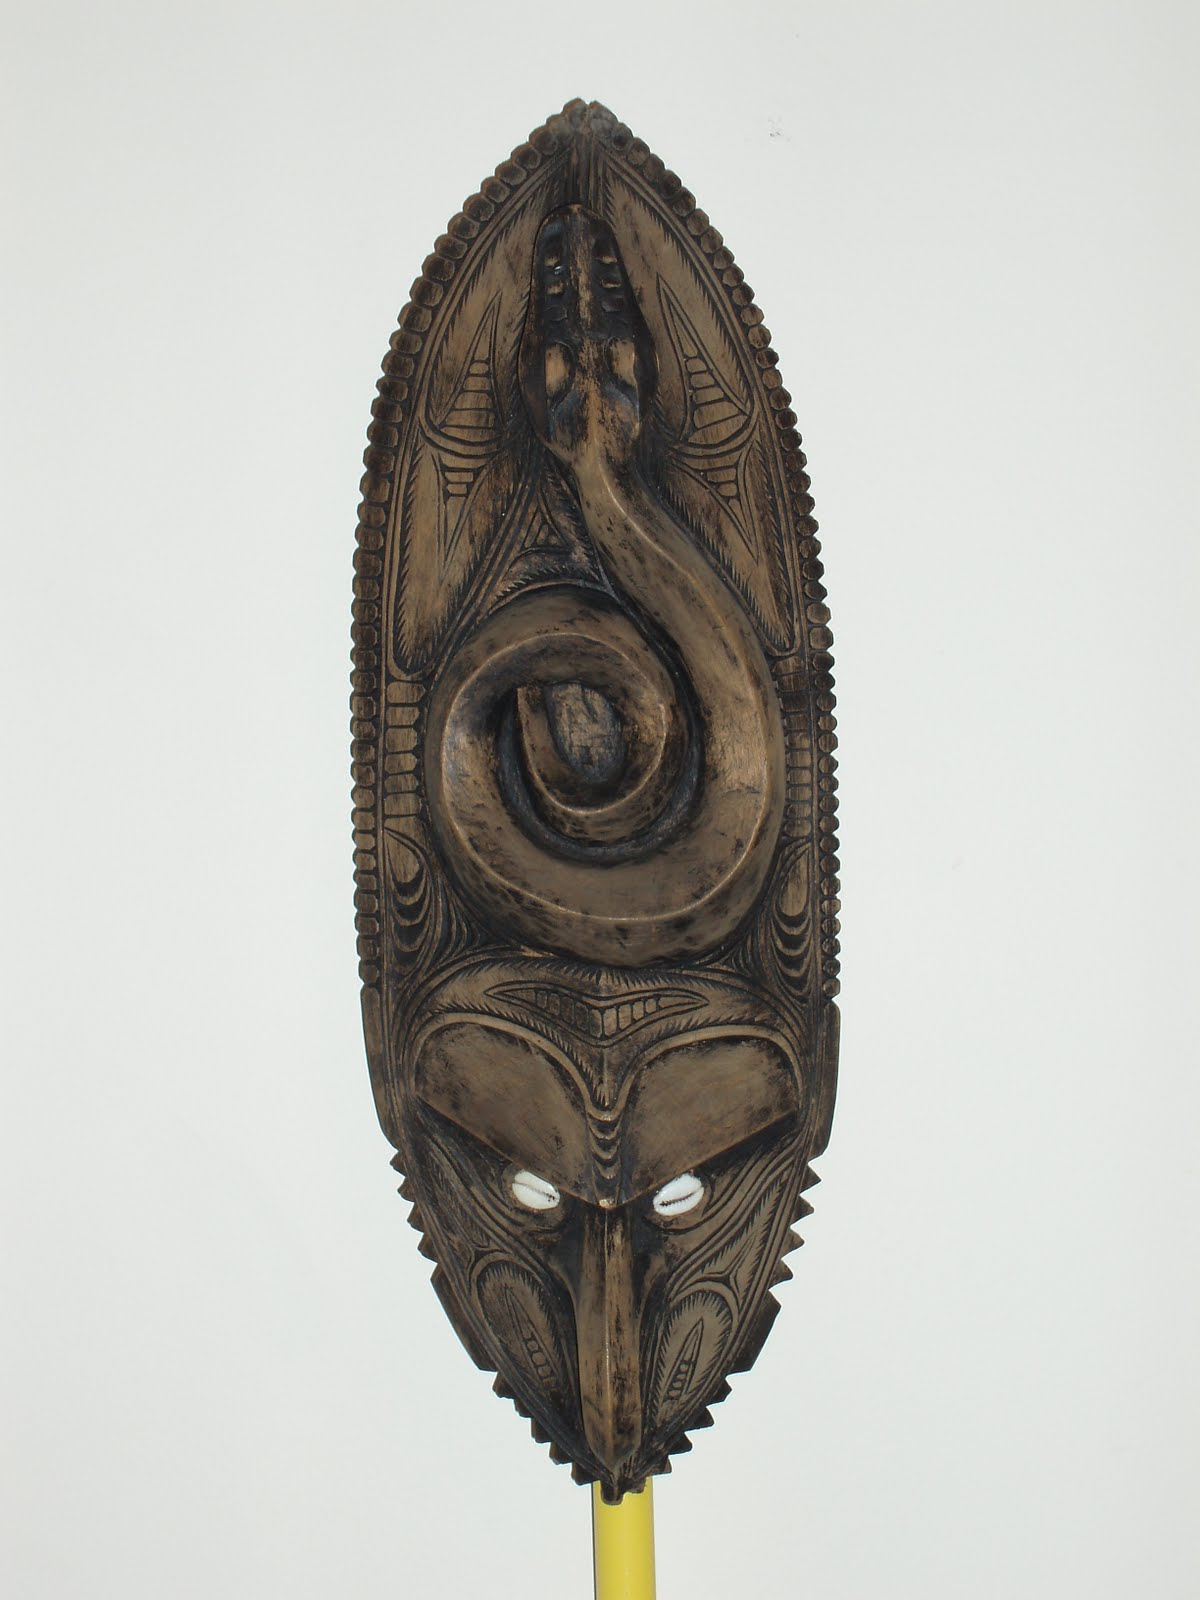 Masks of the World - Mascaras del Mundo: Oceania